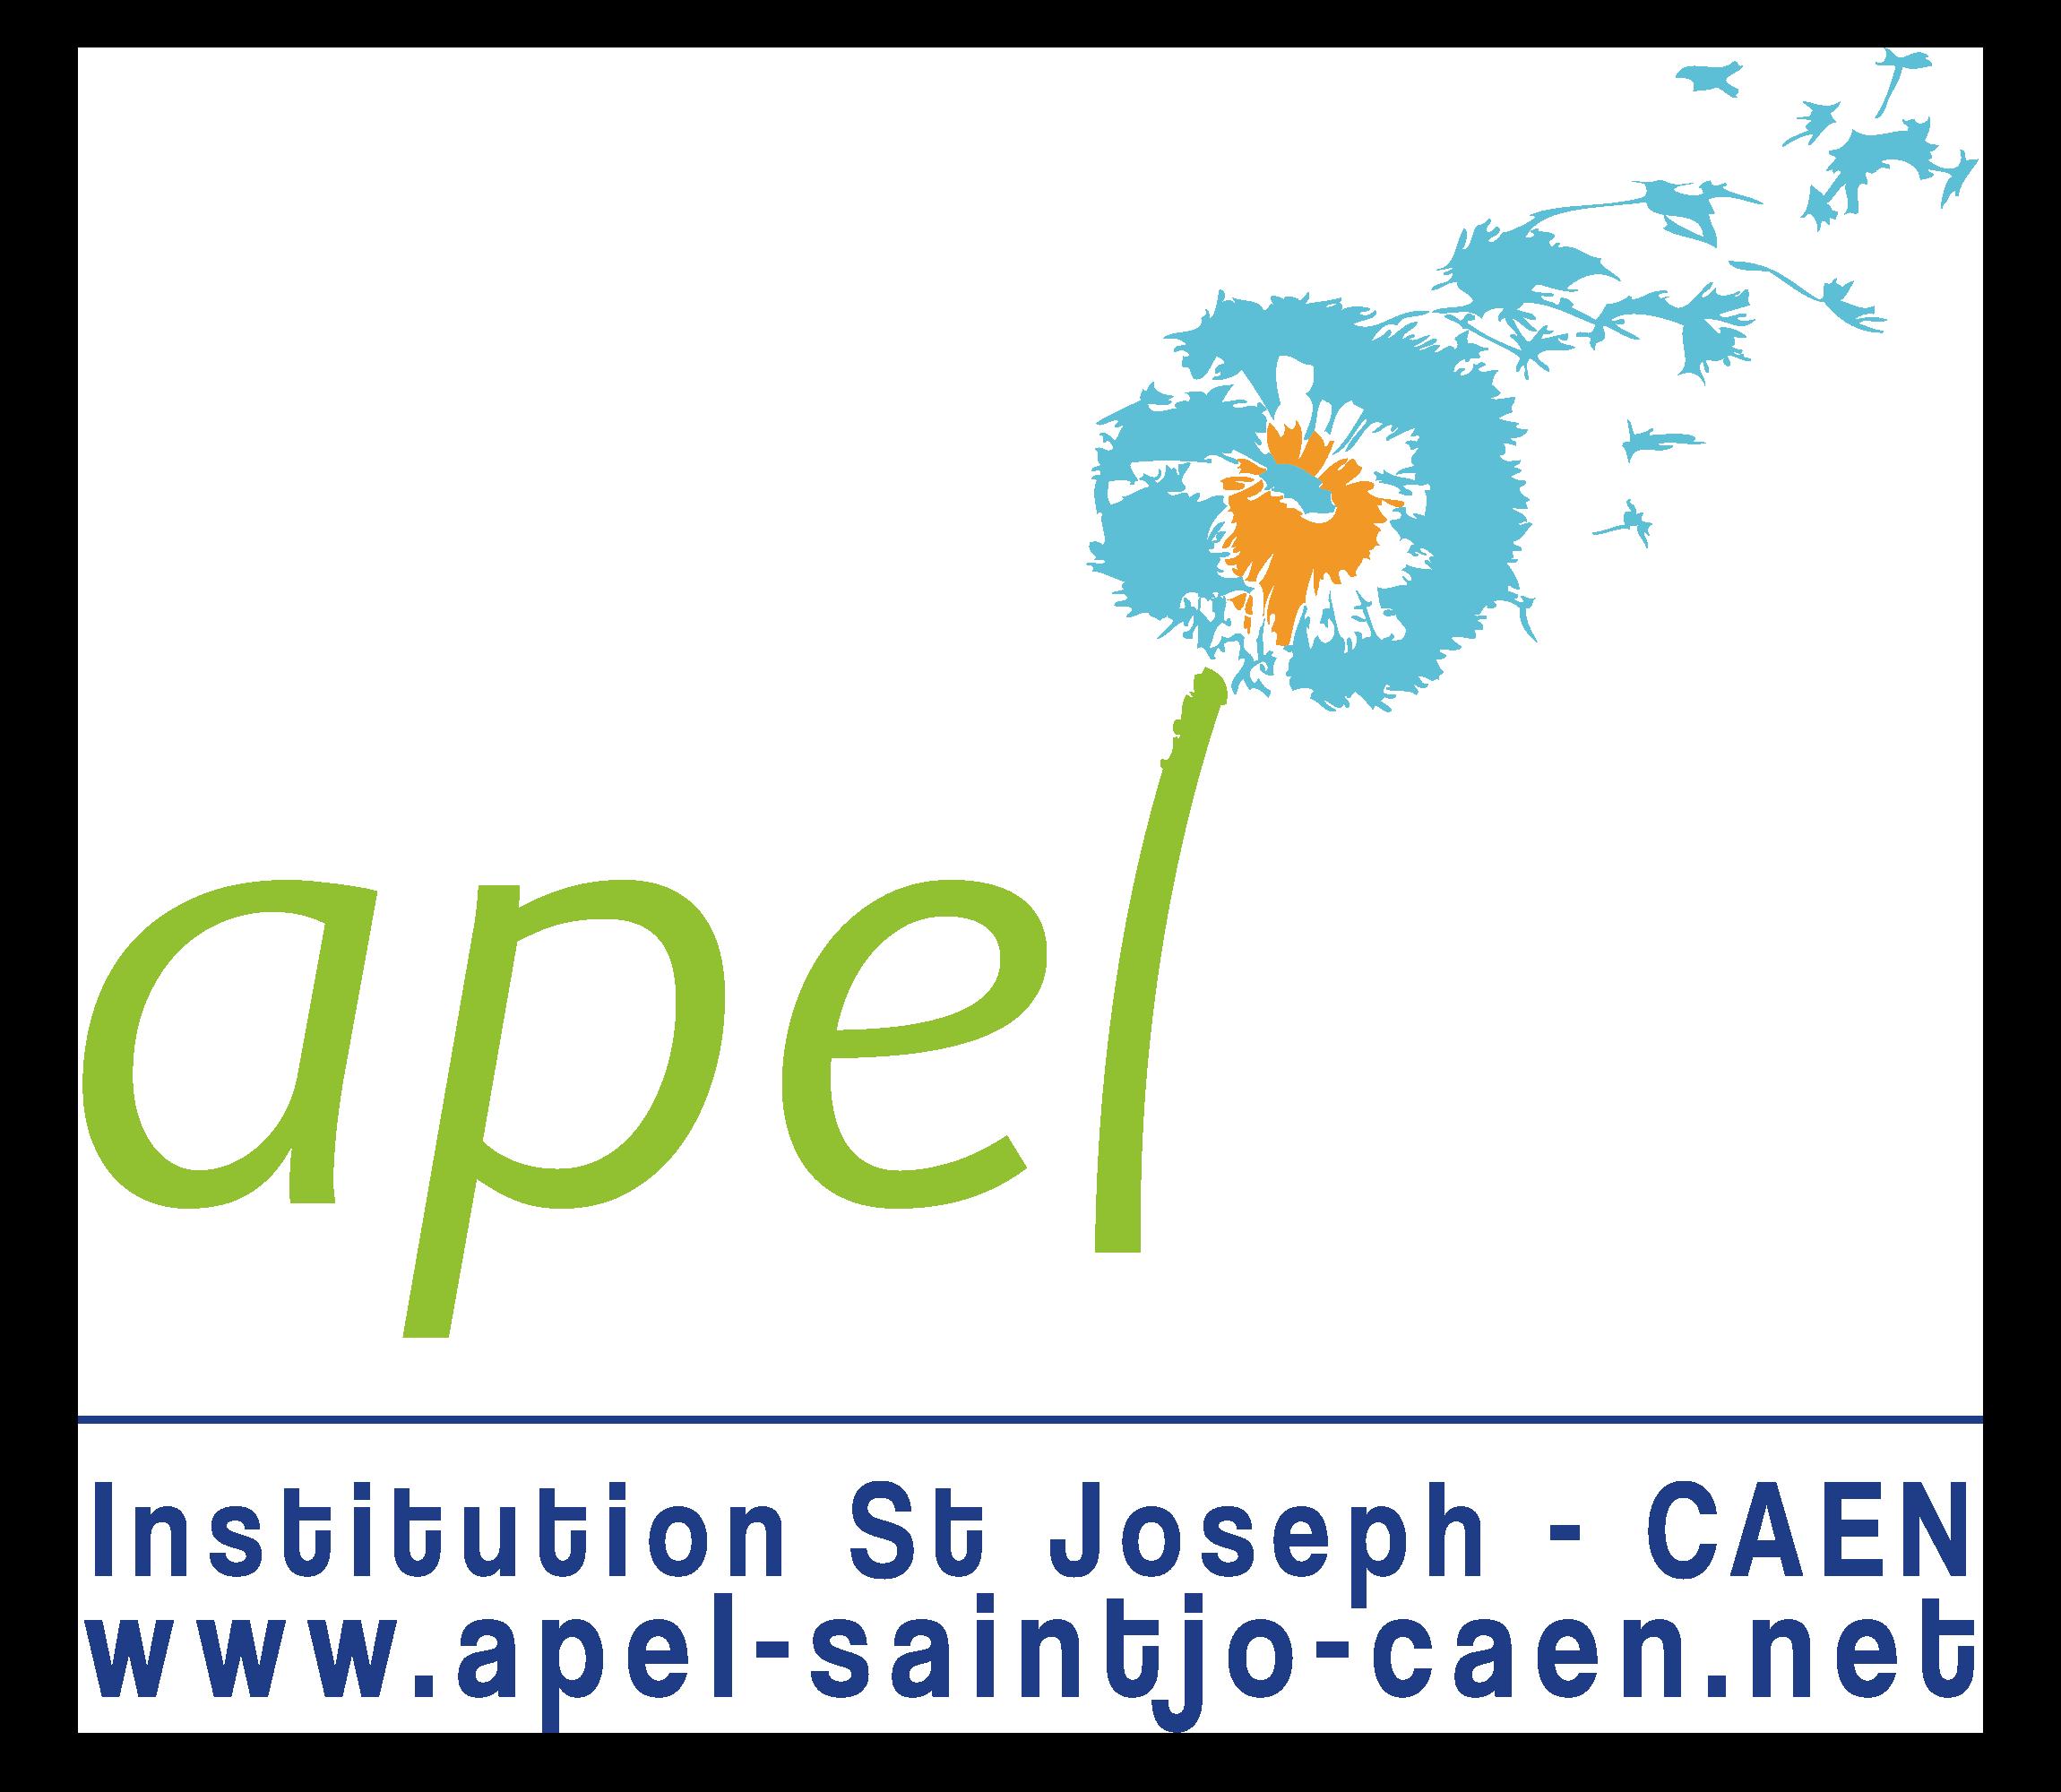 APEL Saint-Joseph Caen